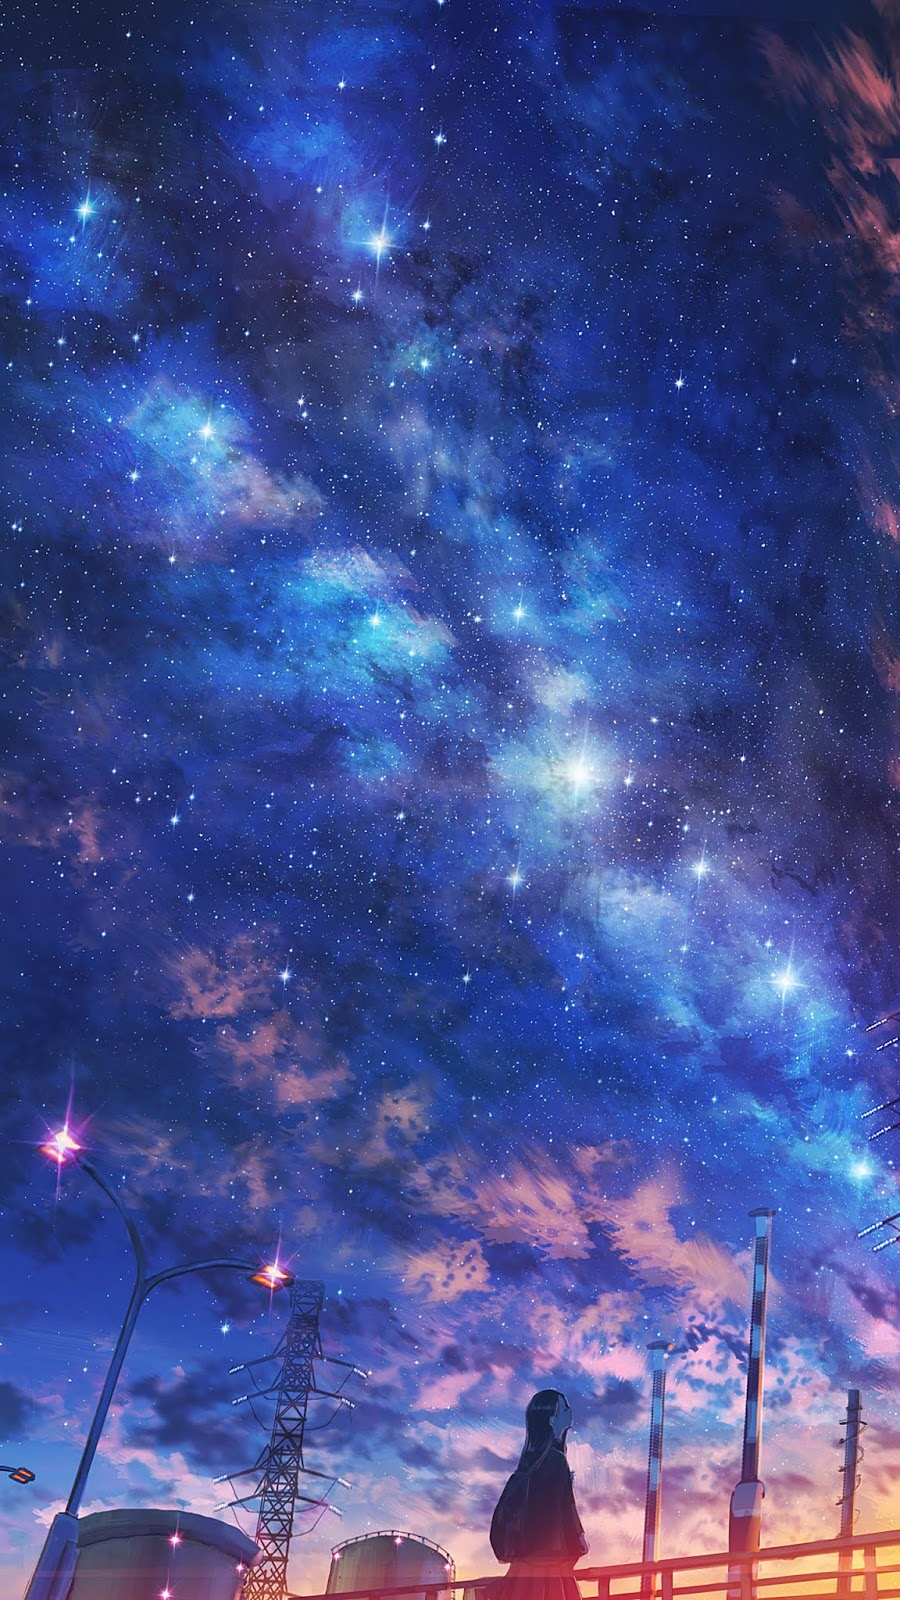 Under night sky